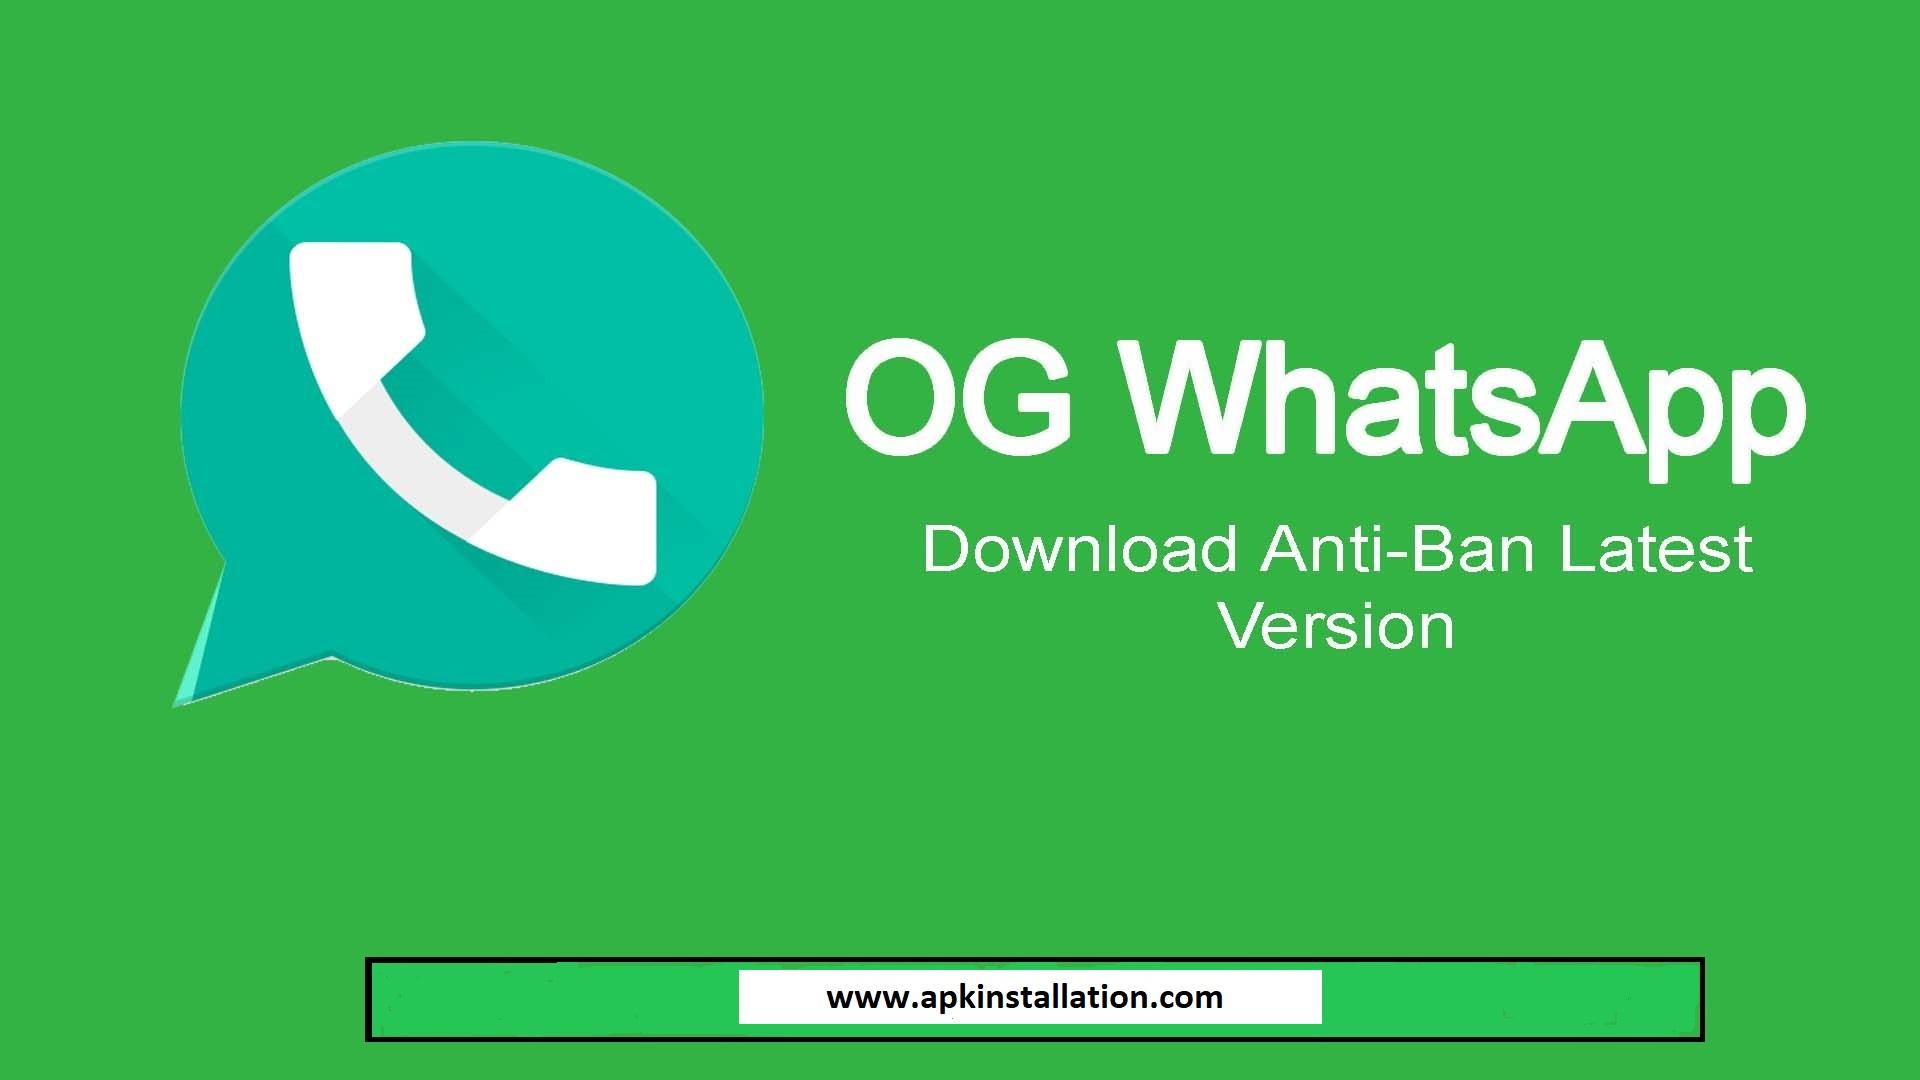 Whatsapp og OGWhatsApp APK